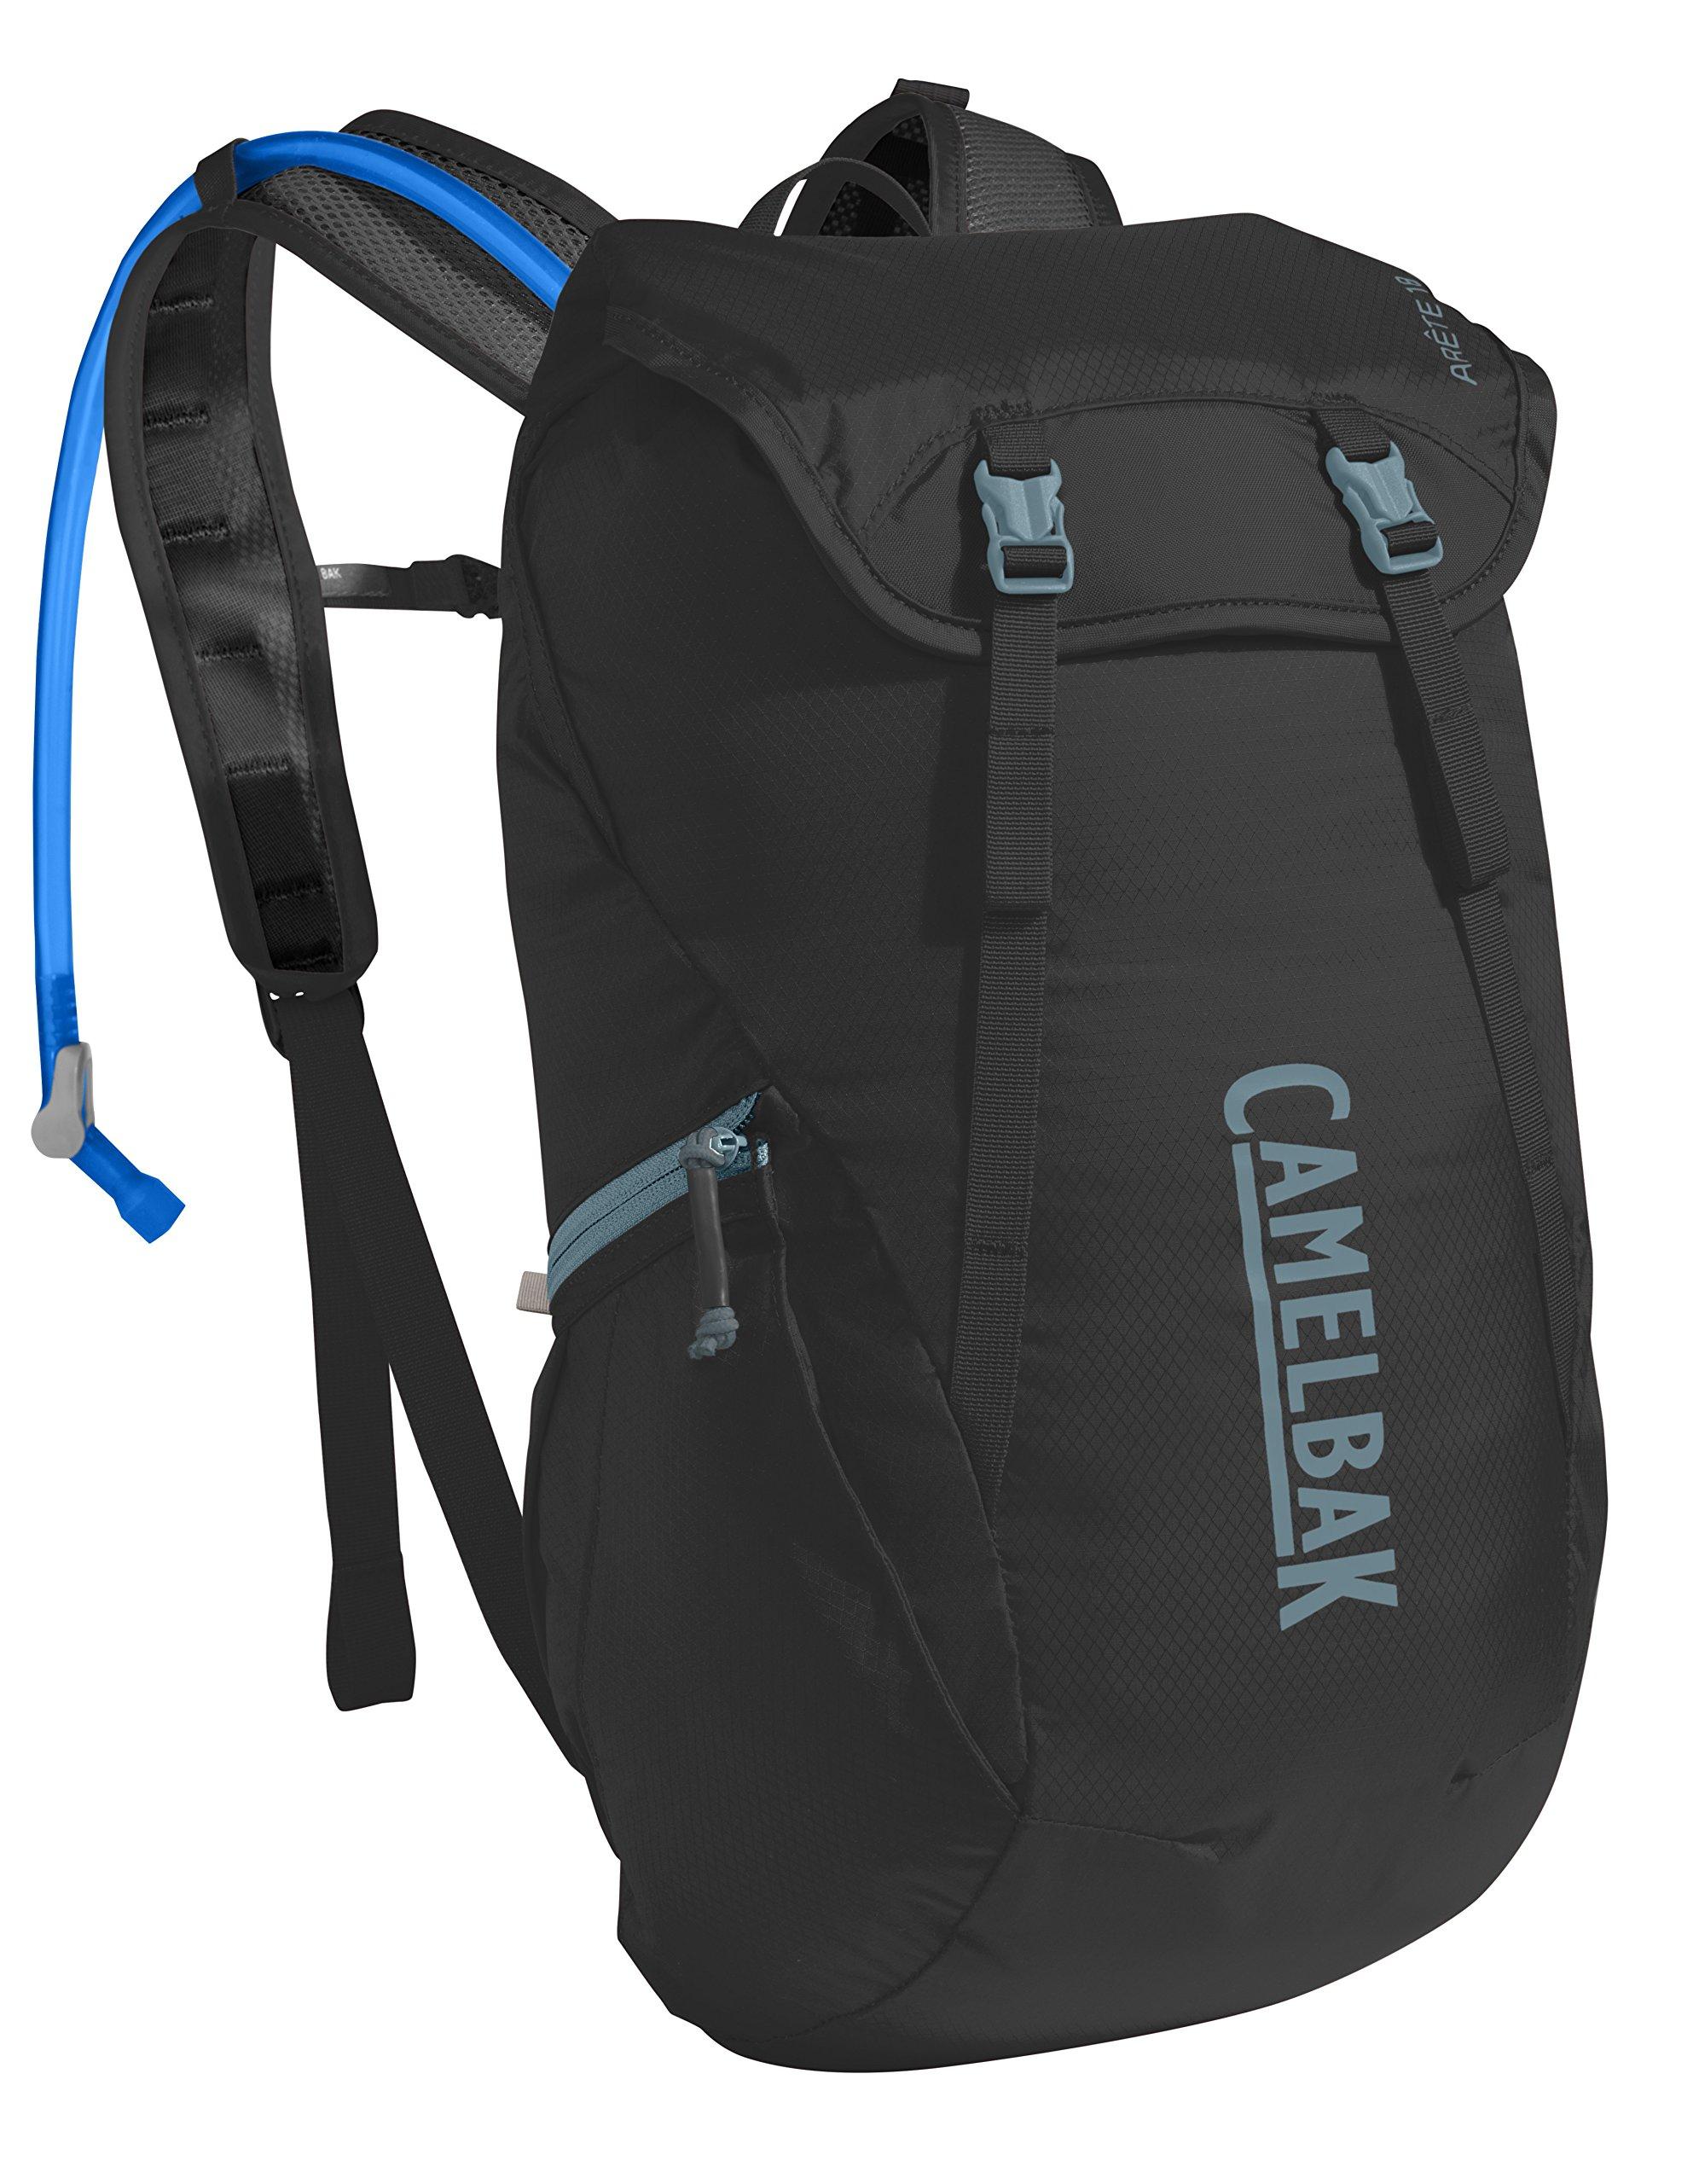 CamelBak Arete 18 Crux Reservoir Hydration Pack, Black/Slate Grey, 1.5 L/50 oz